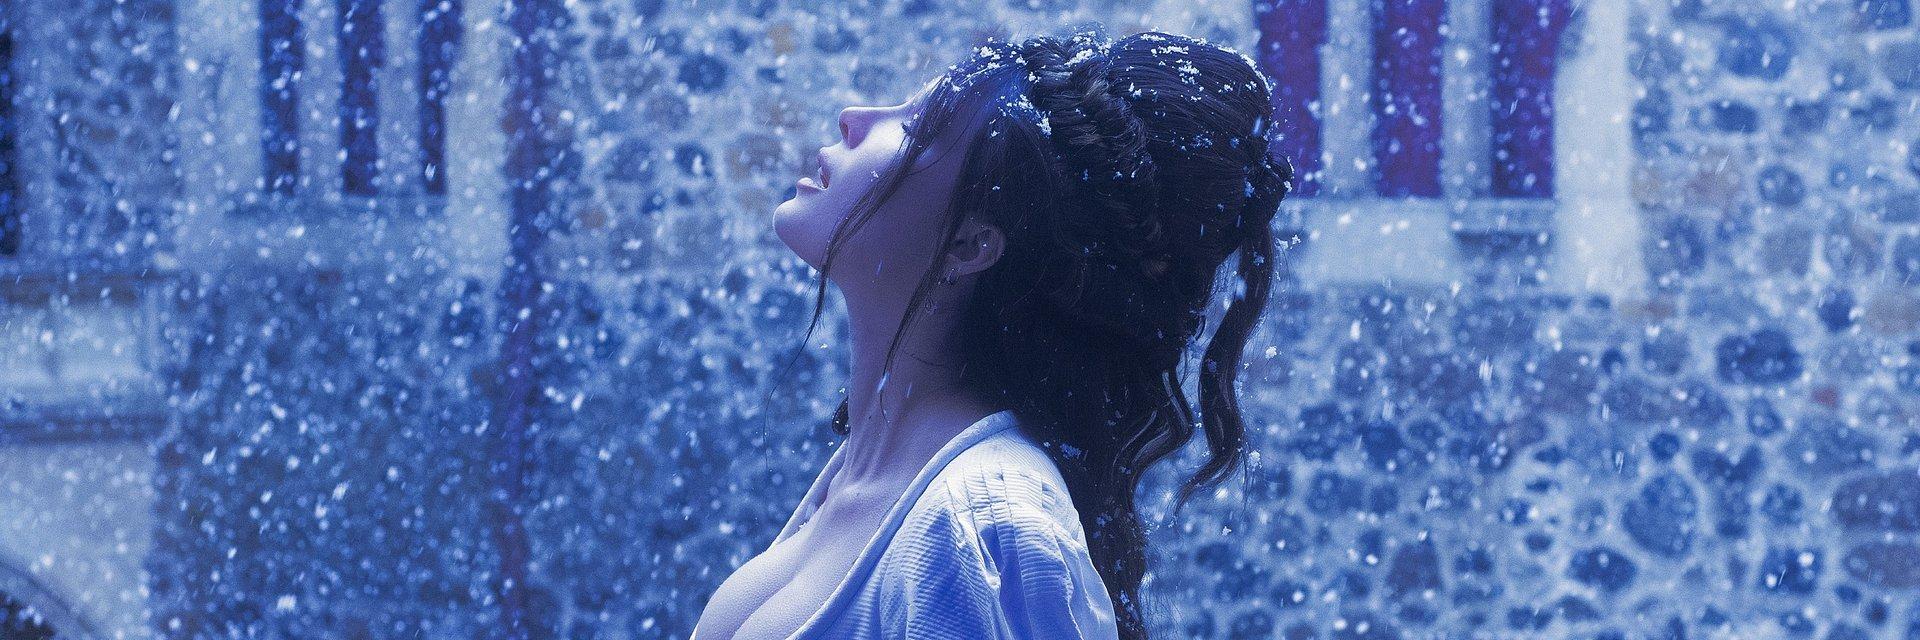 "Halsey wydała nowy album ""If I Can't Have Love, I Want Power"""